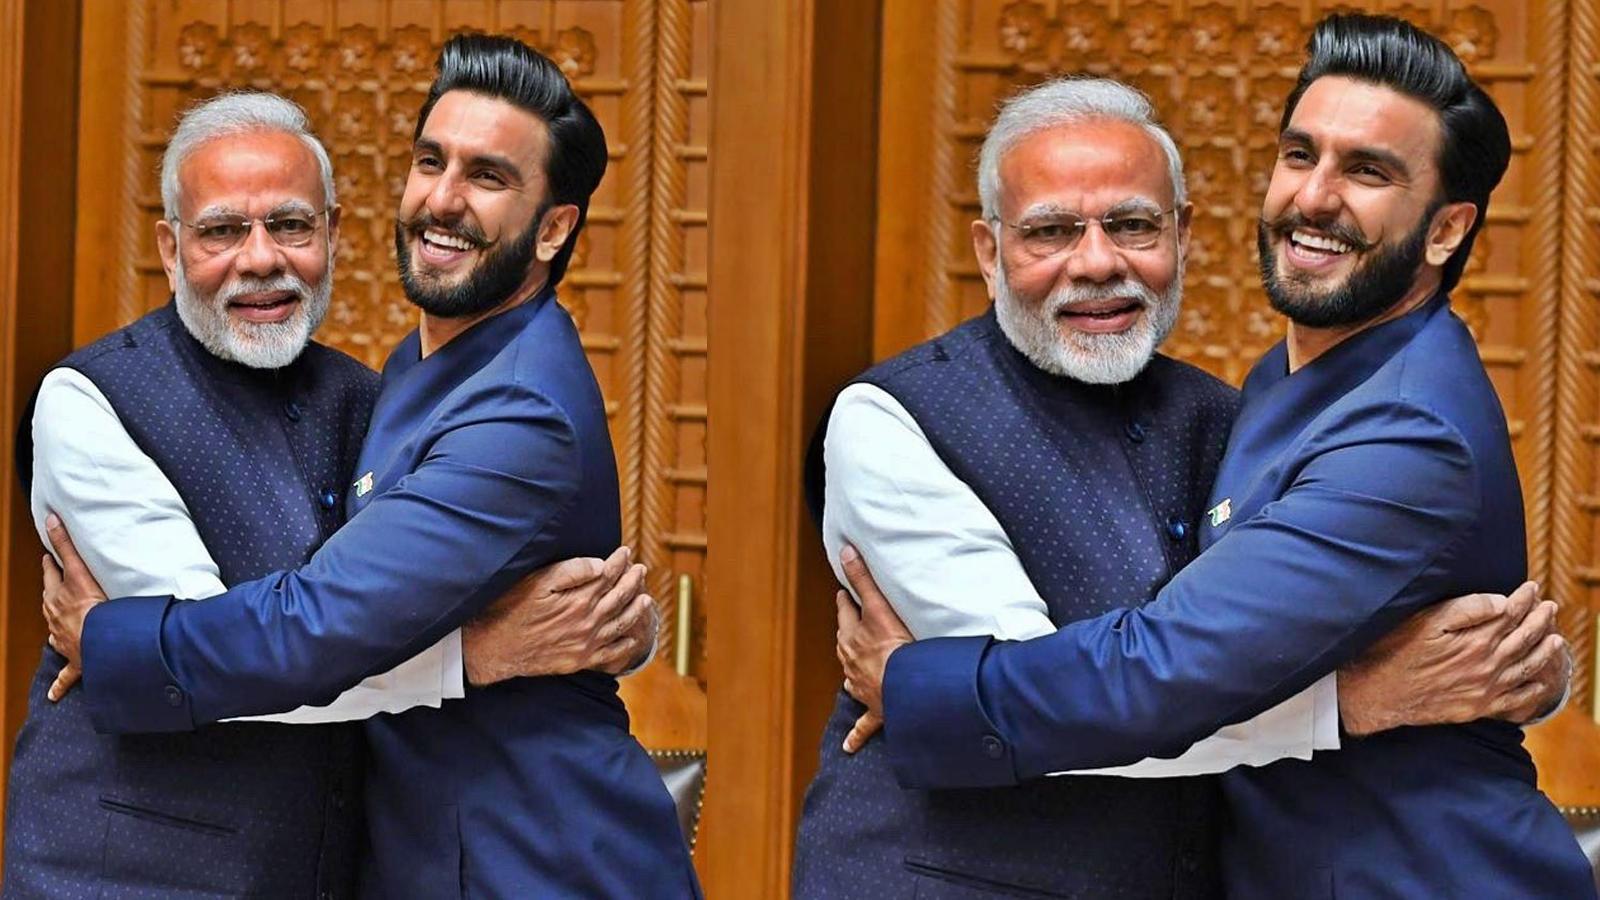 Ranveer Singh gives 'Jaadoo ki Jhappi' to PM Narendra Modi